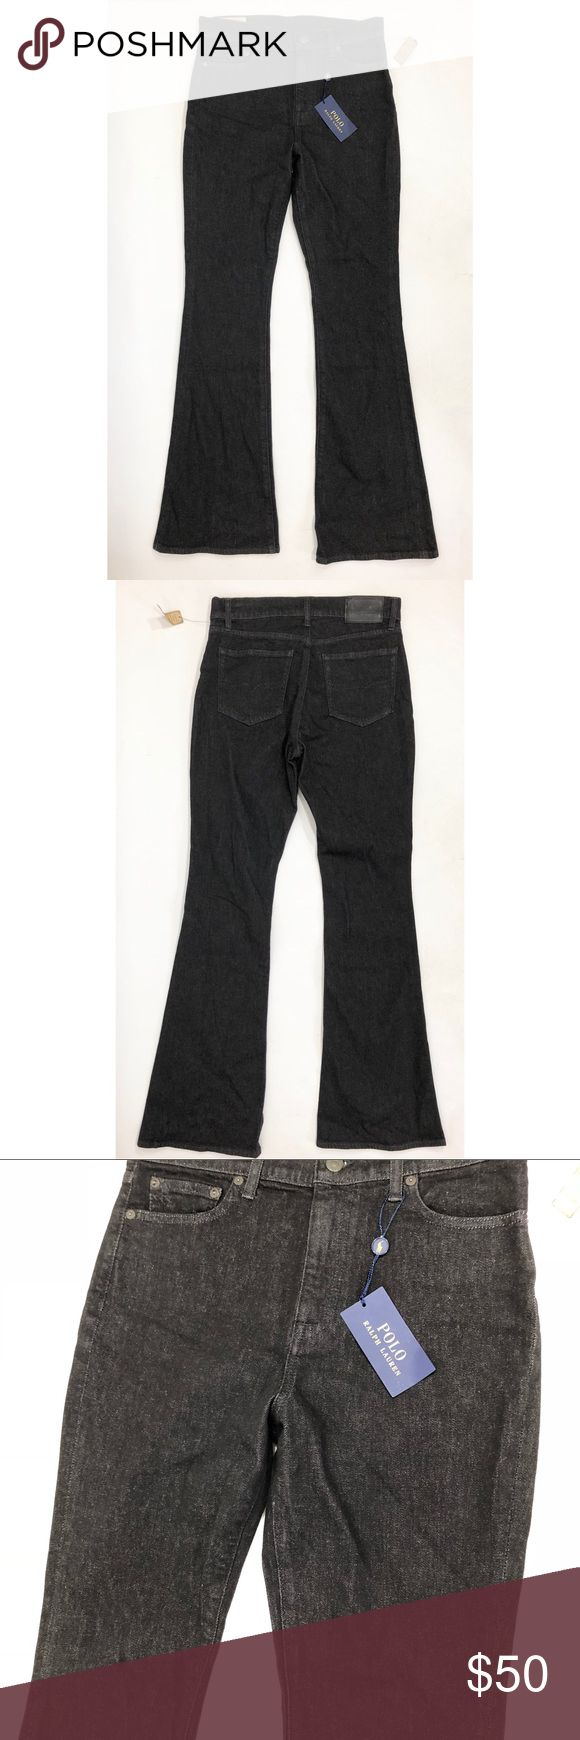 Polo Ralph Lauren Jeans 30 Black Denim Flare Leg Polo Ralph Lauren Womens Jeans Size 30 Black Denim Flare Leg NEW. Measurements: (in inches) - Waist:32 - Length: 46 -Inseam:34 Polo by Ralph Lauren Jeans Flare & Wide Leg